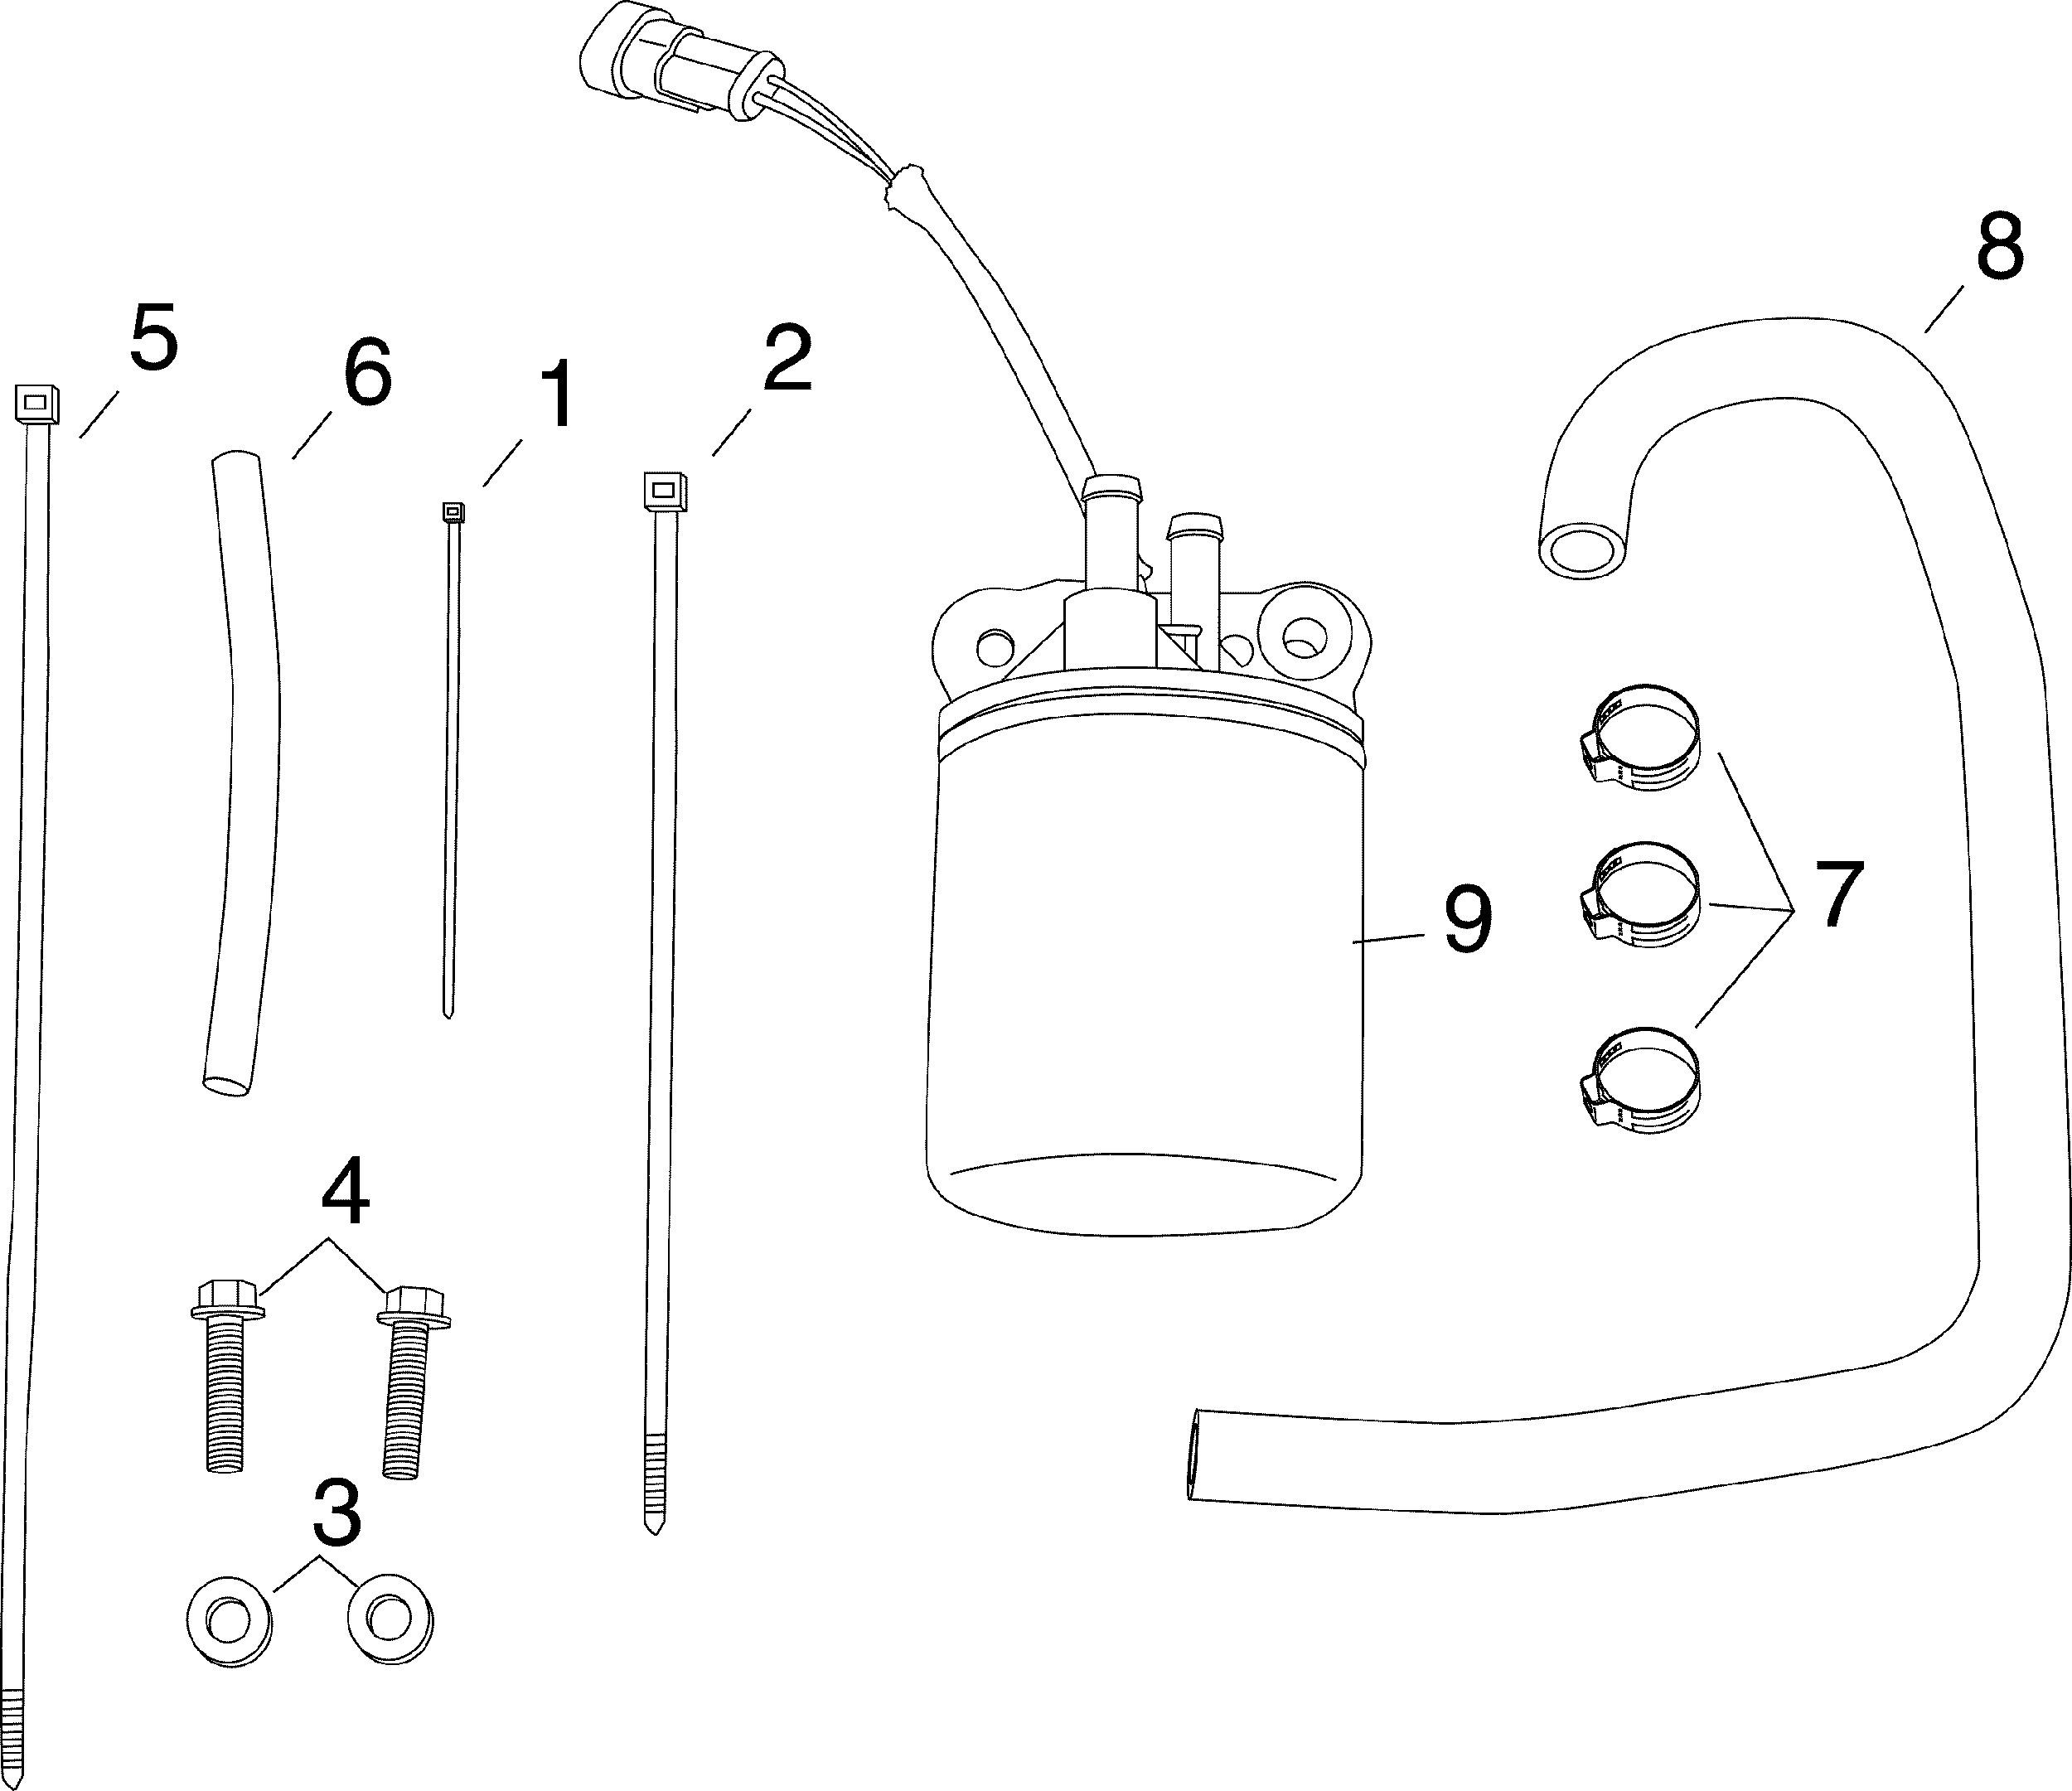 Evinrude Outboard Parts Diagram 25 Hp Johnson Outboard